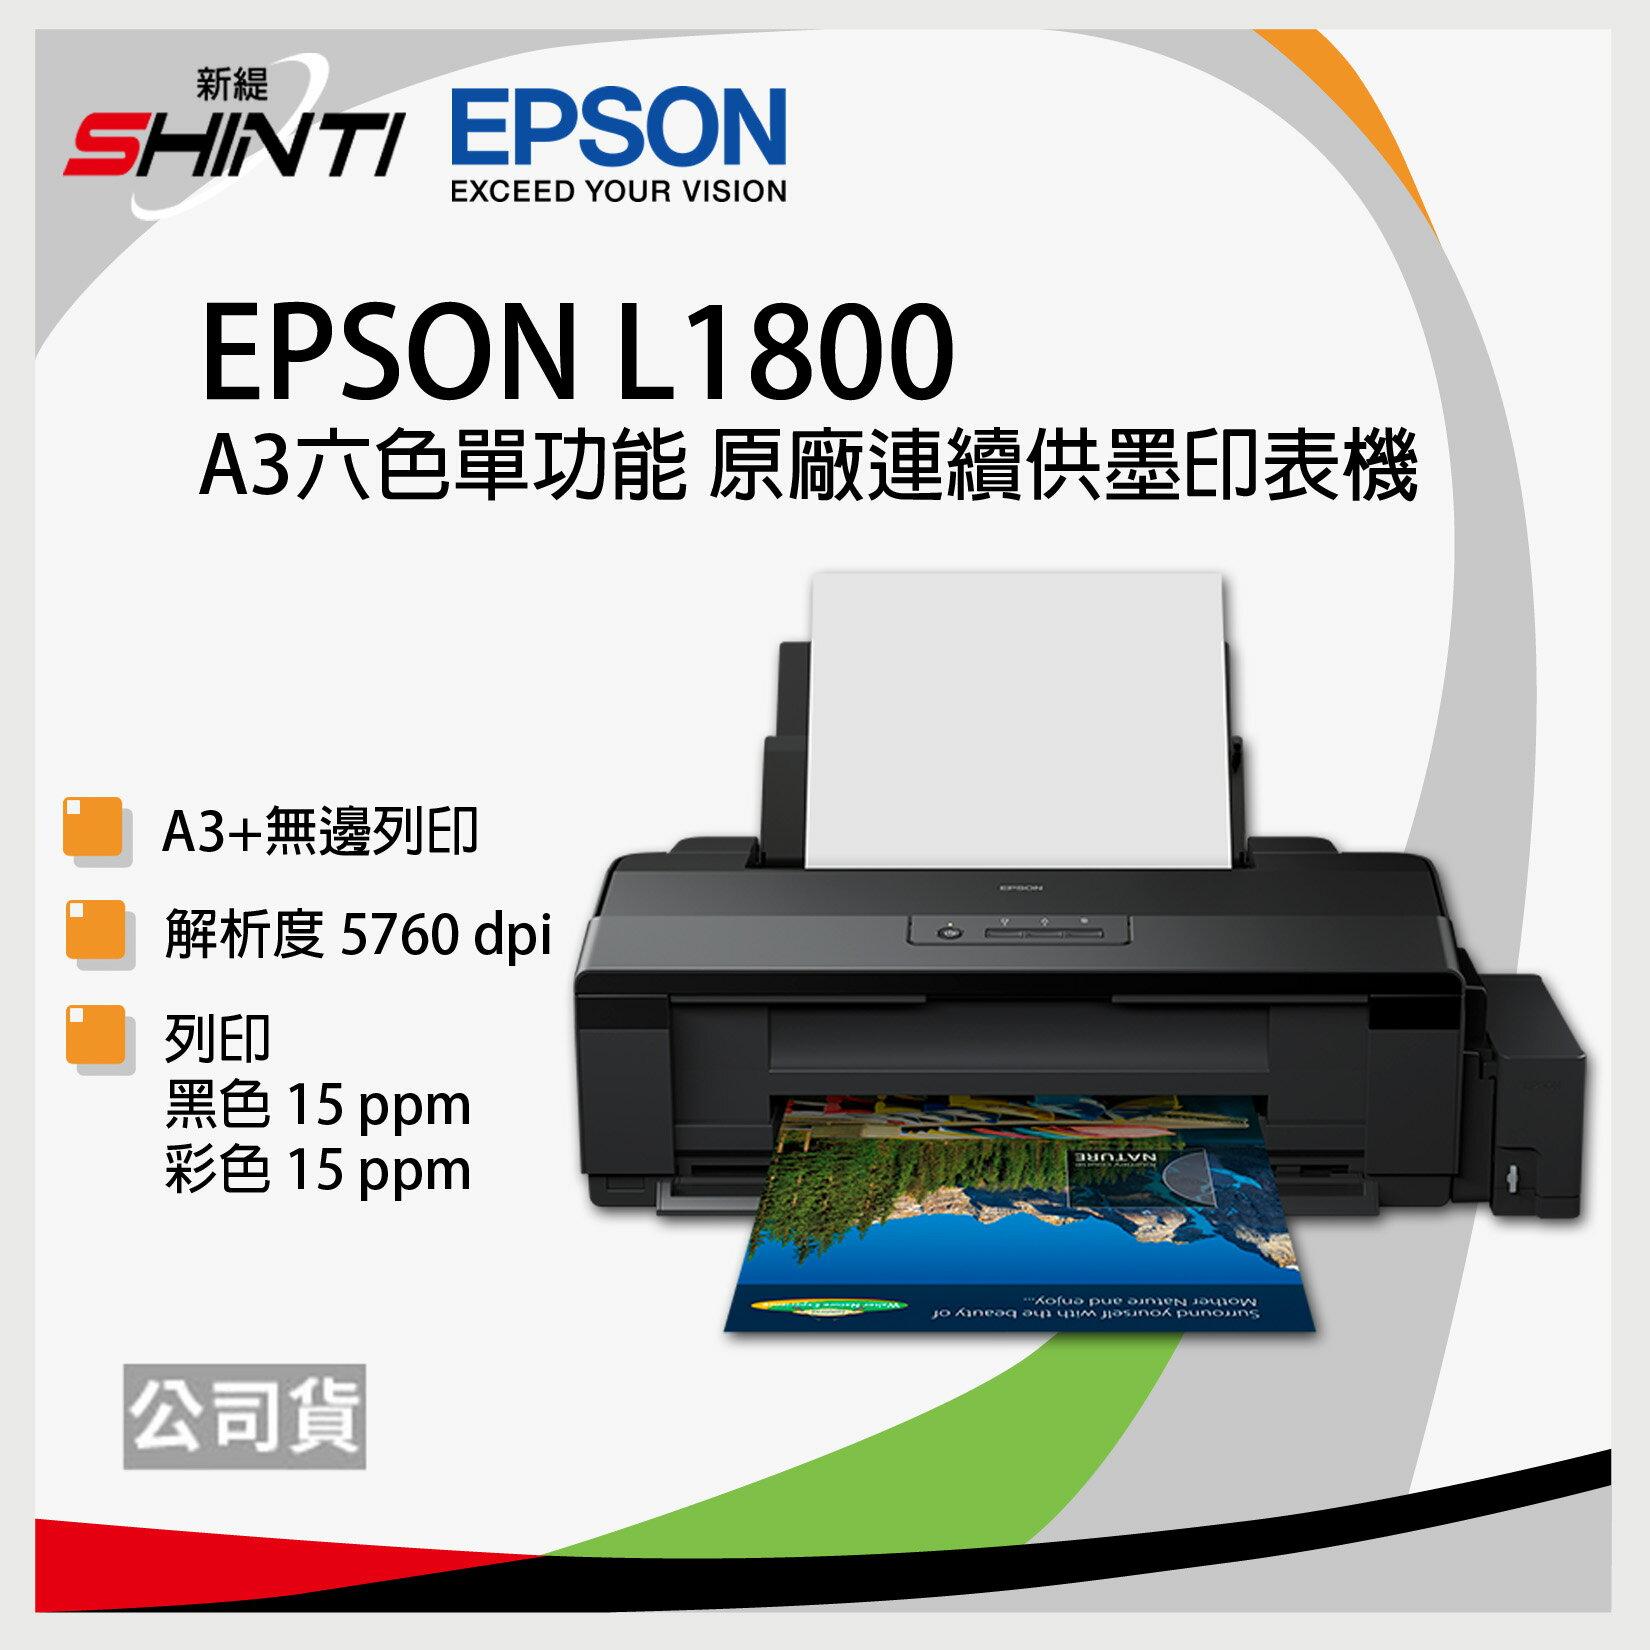 EPSON L1800 原廠A3單功能連續供墨印表機